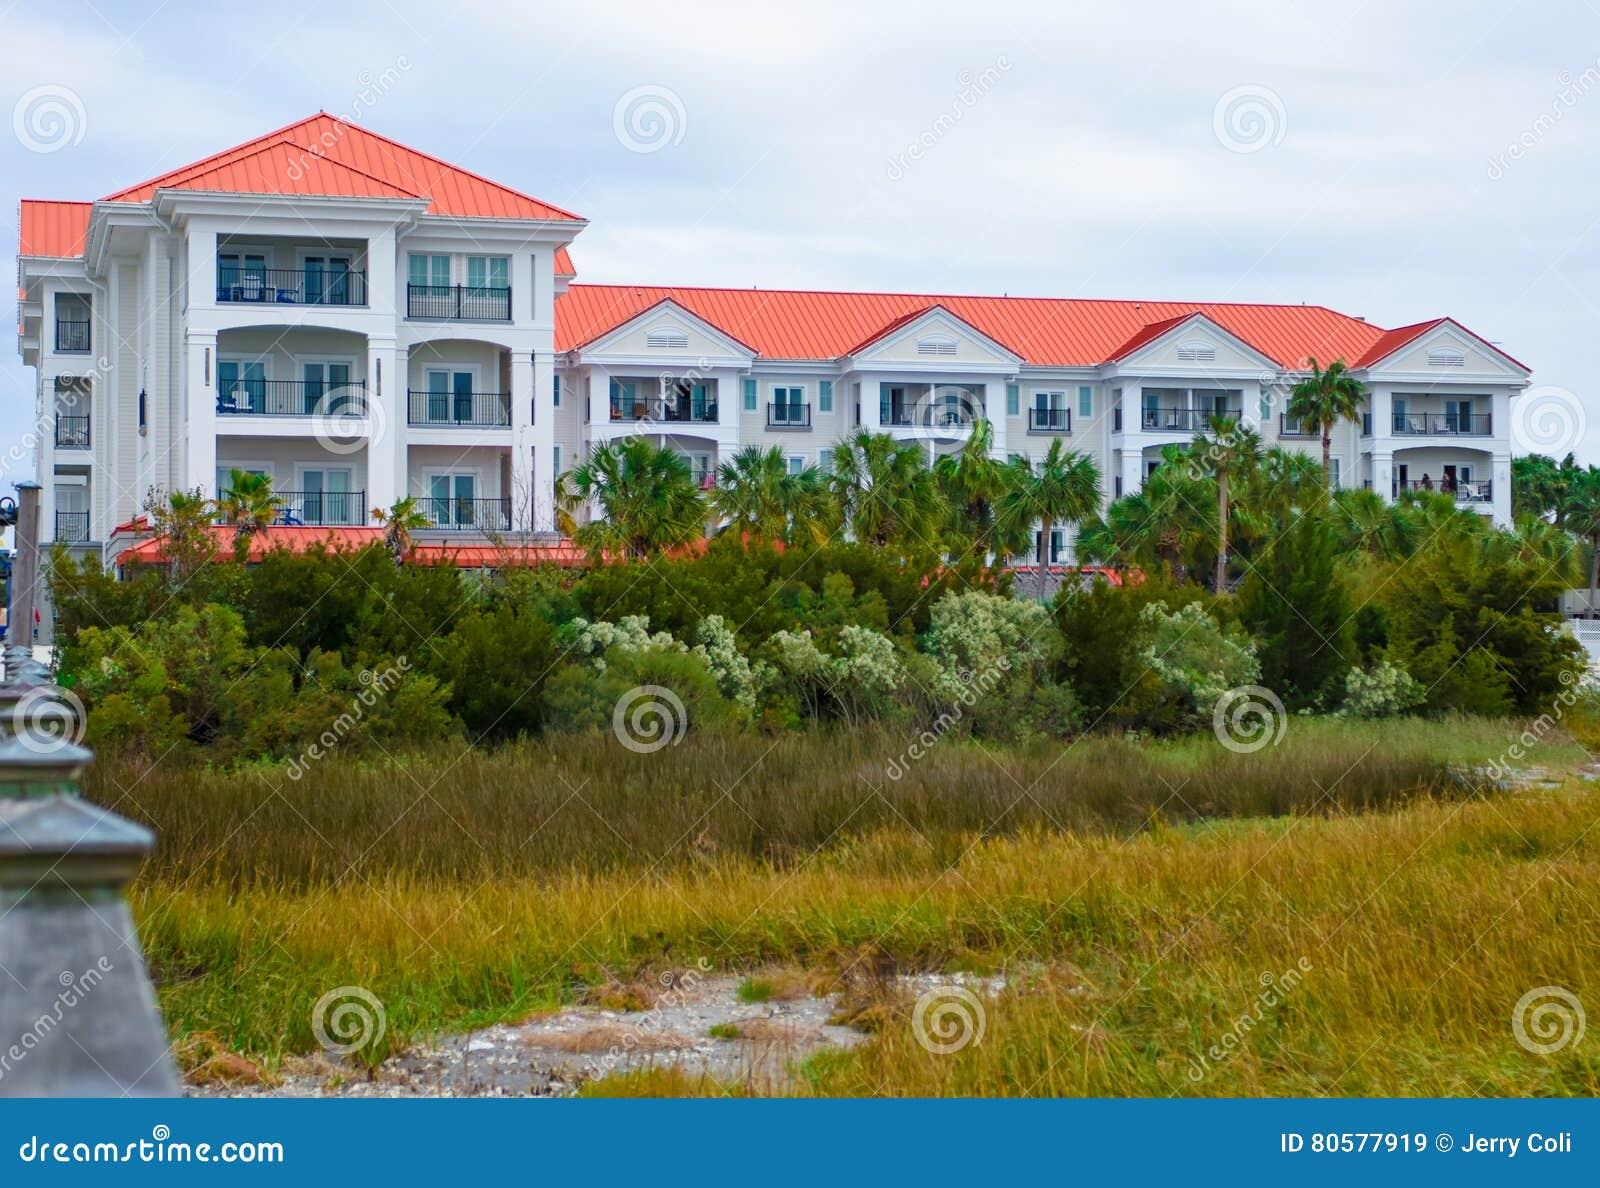 Charleston harbor resort marina editorial stock image for 3d dreams fort mill sc